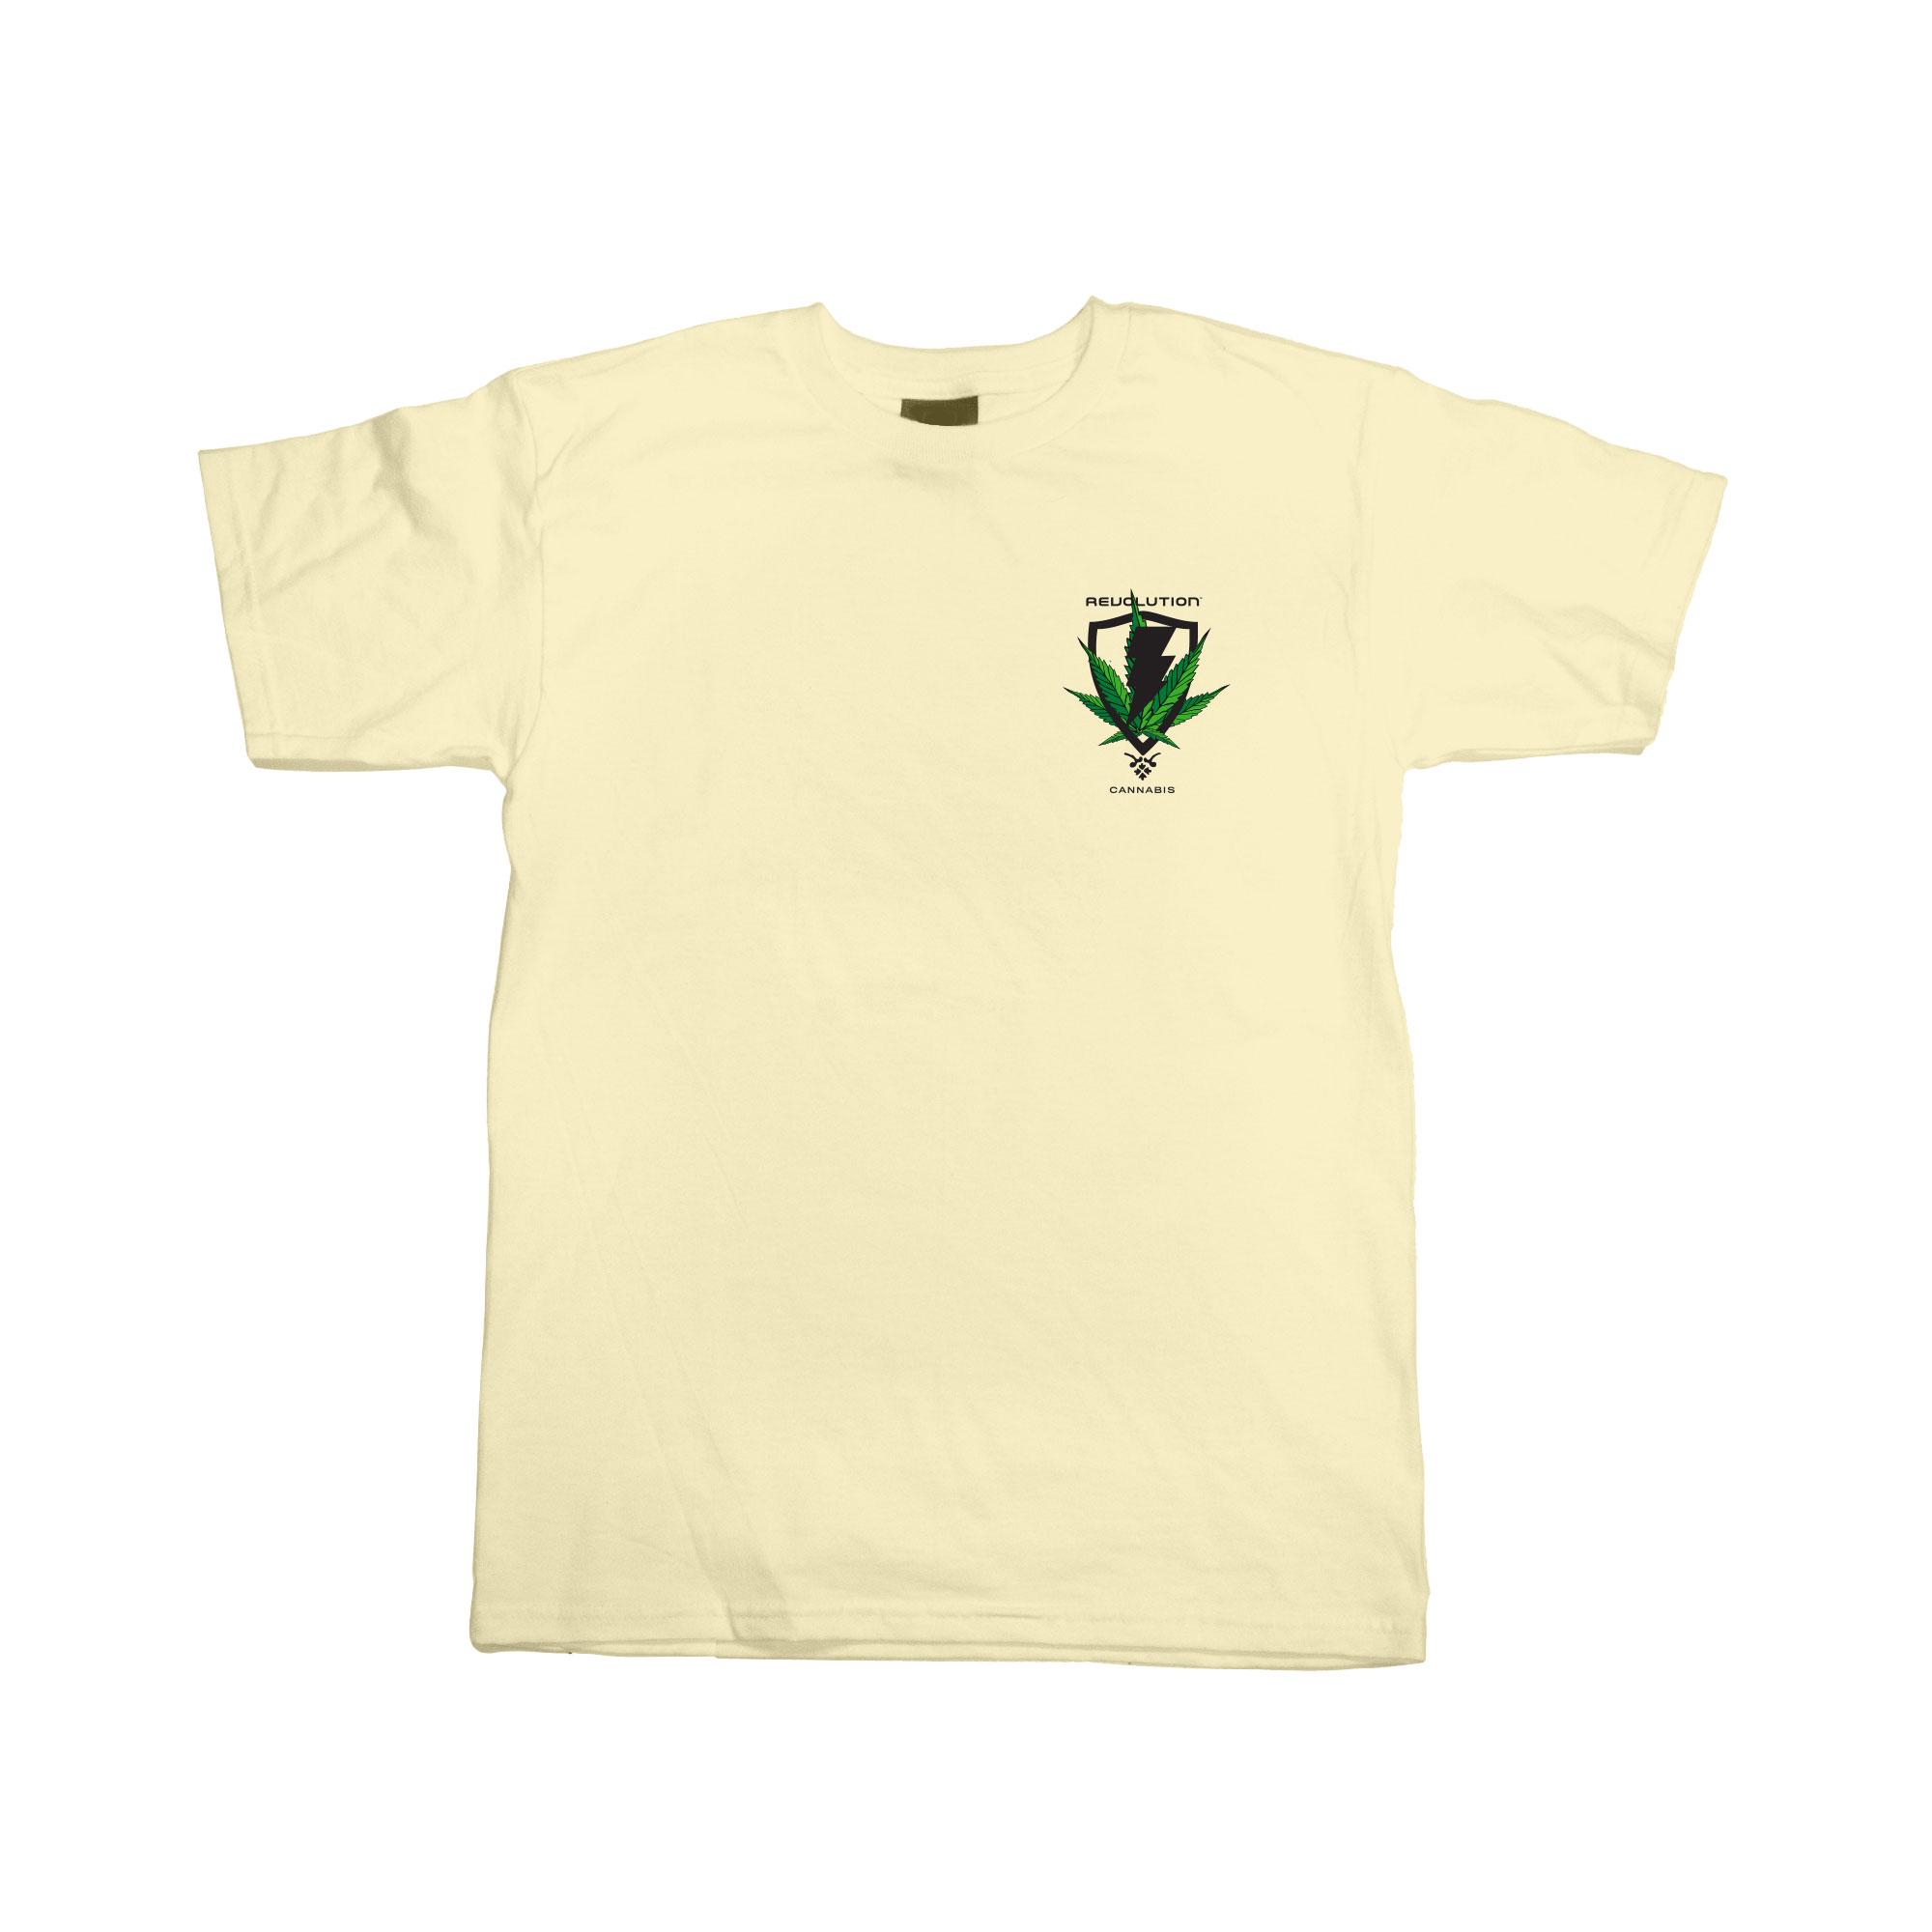 jugrnaut-revolution-cannabis-cream-1